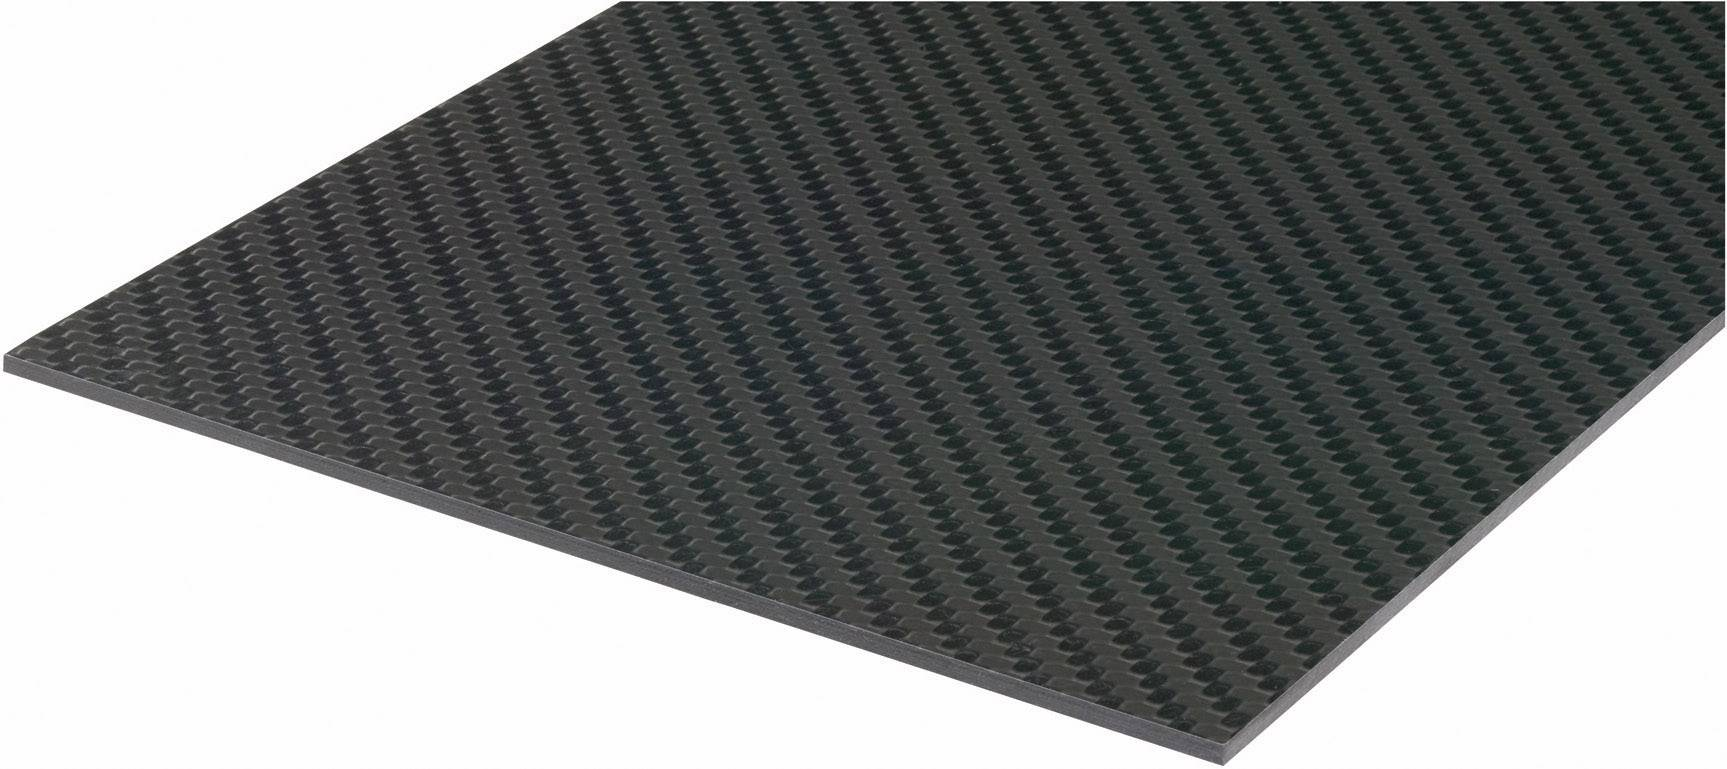 Uhlíková prepreg doska Carbotec 229915, (d x š) 340 mm x 150 mm x 1 mm